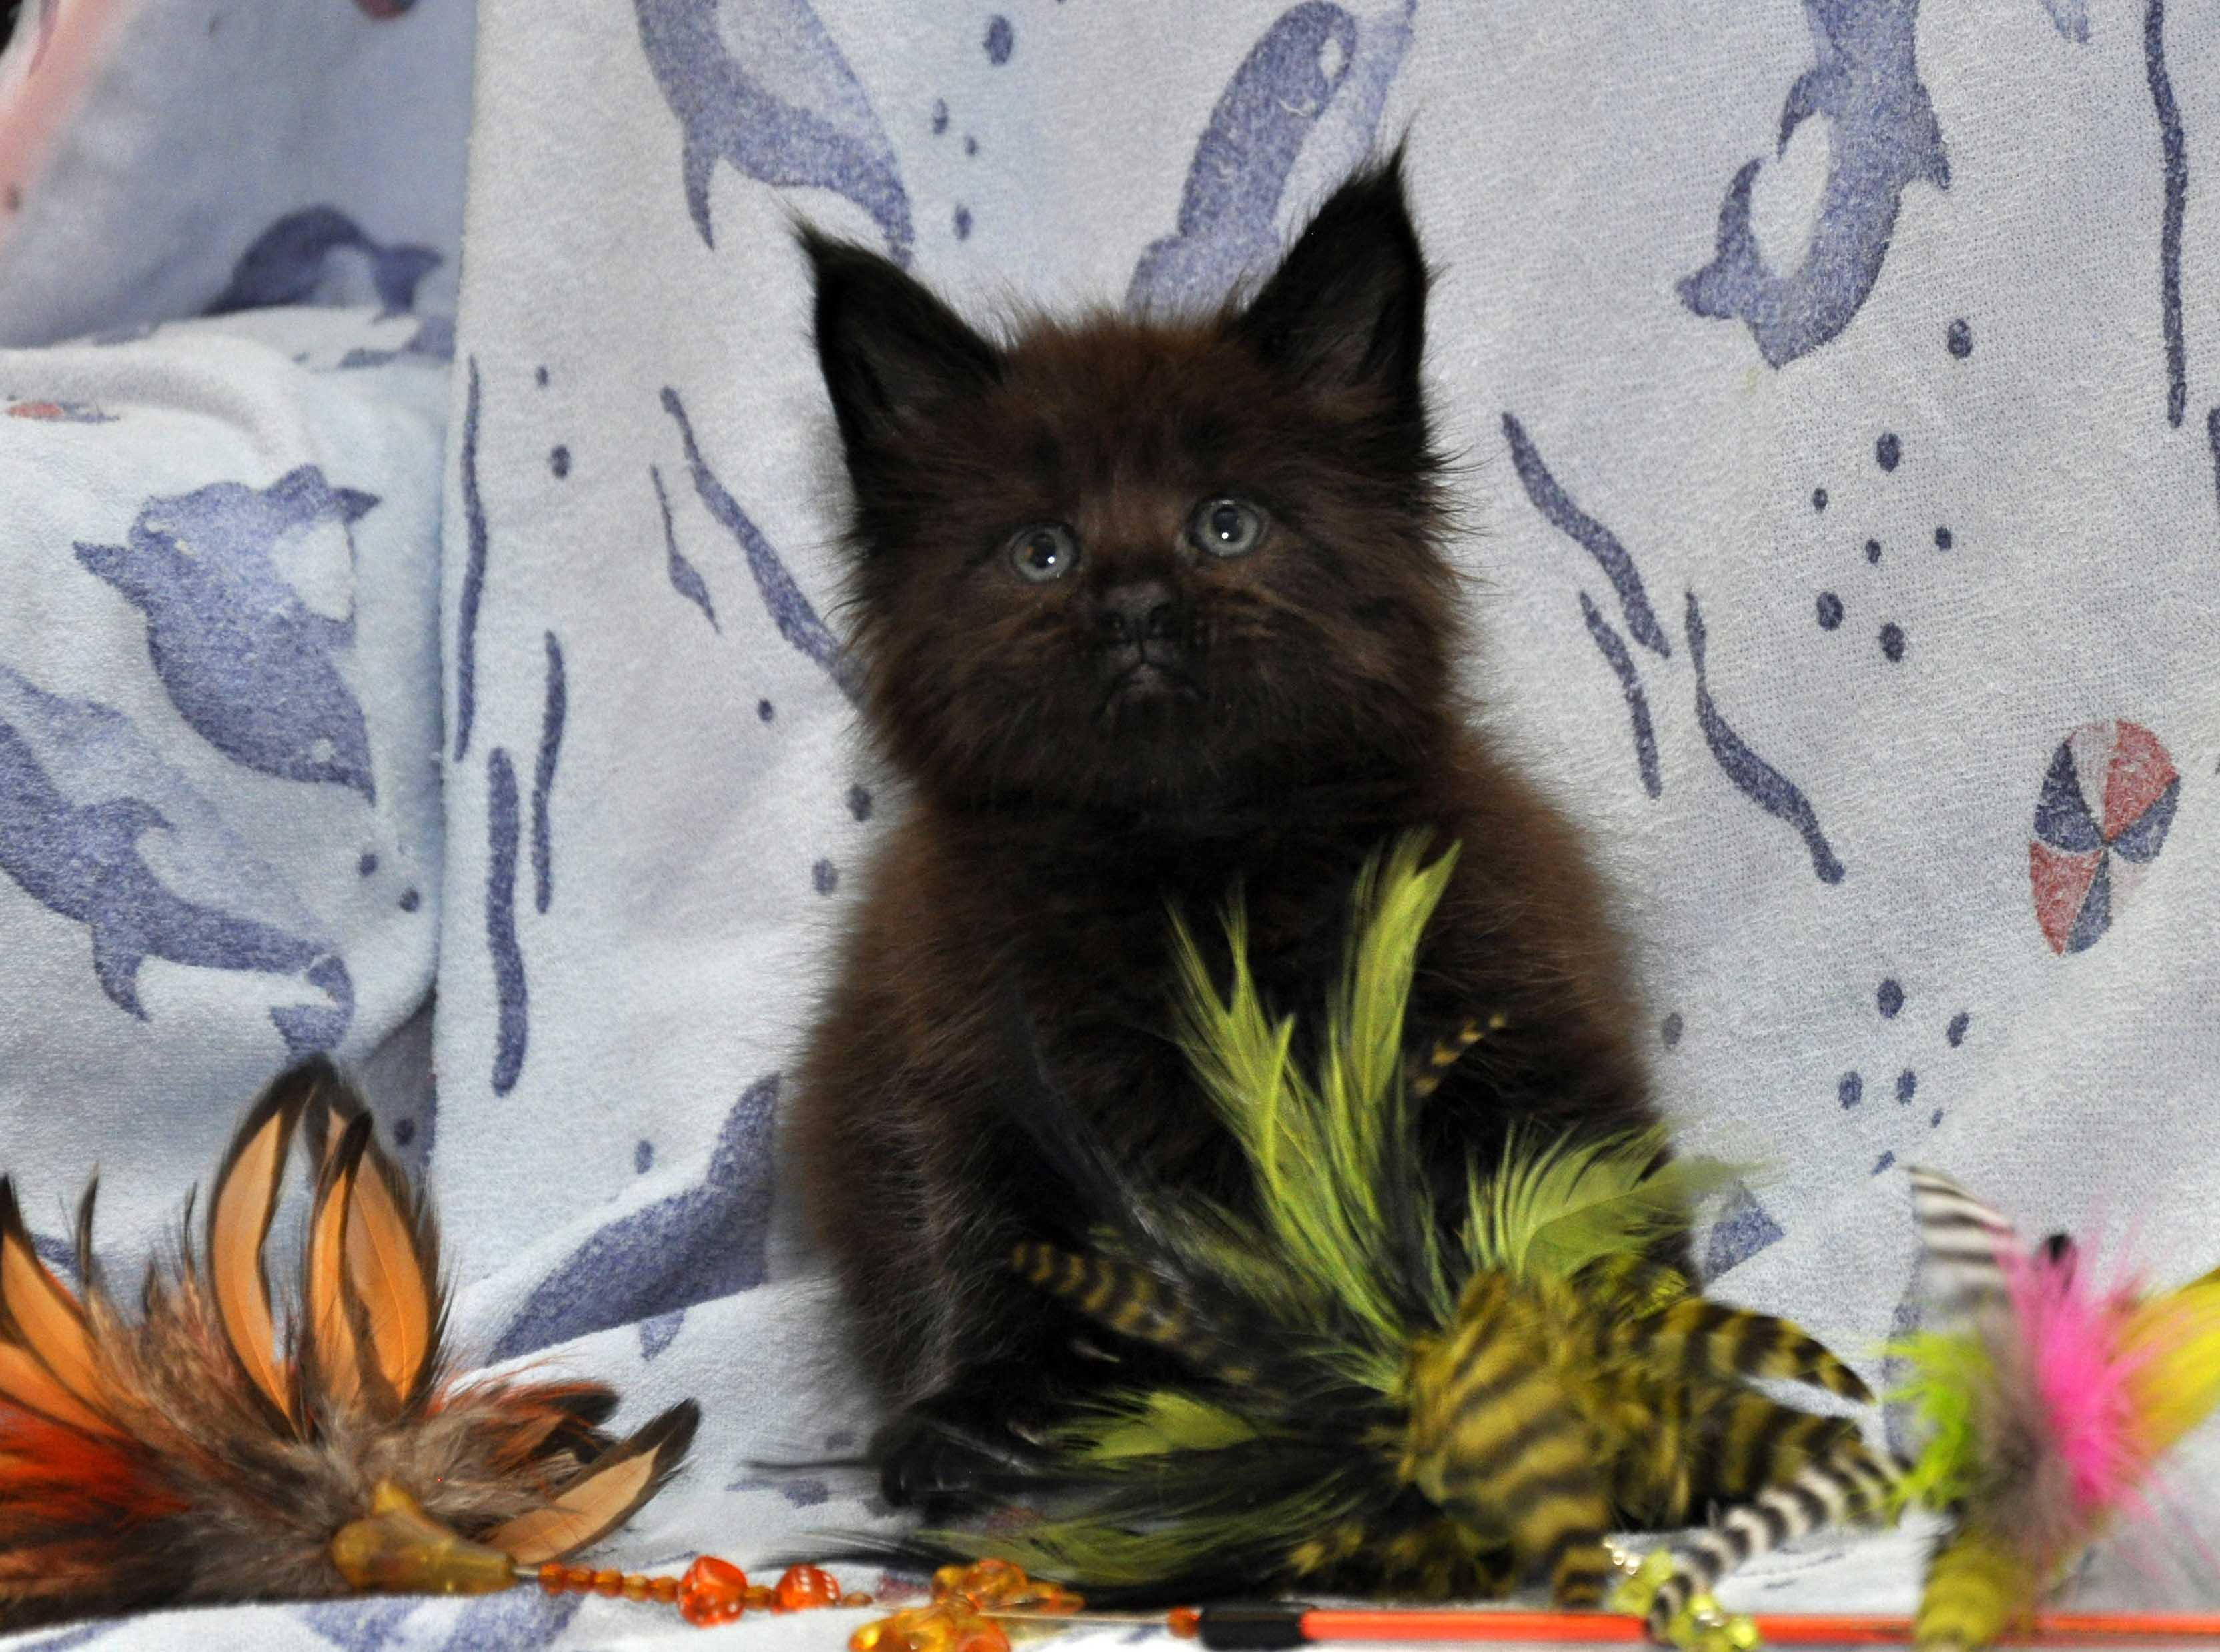 Кот Мейн Кун 3 (male) Eyktan QUAKE фото 7